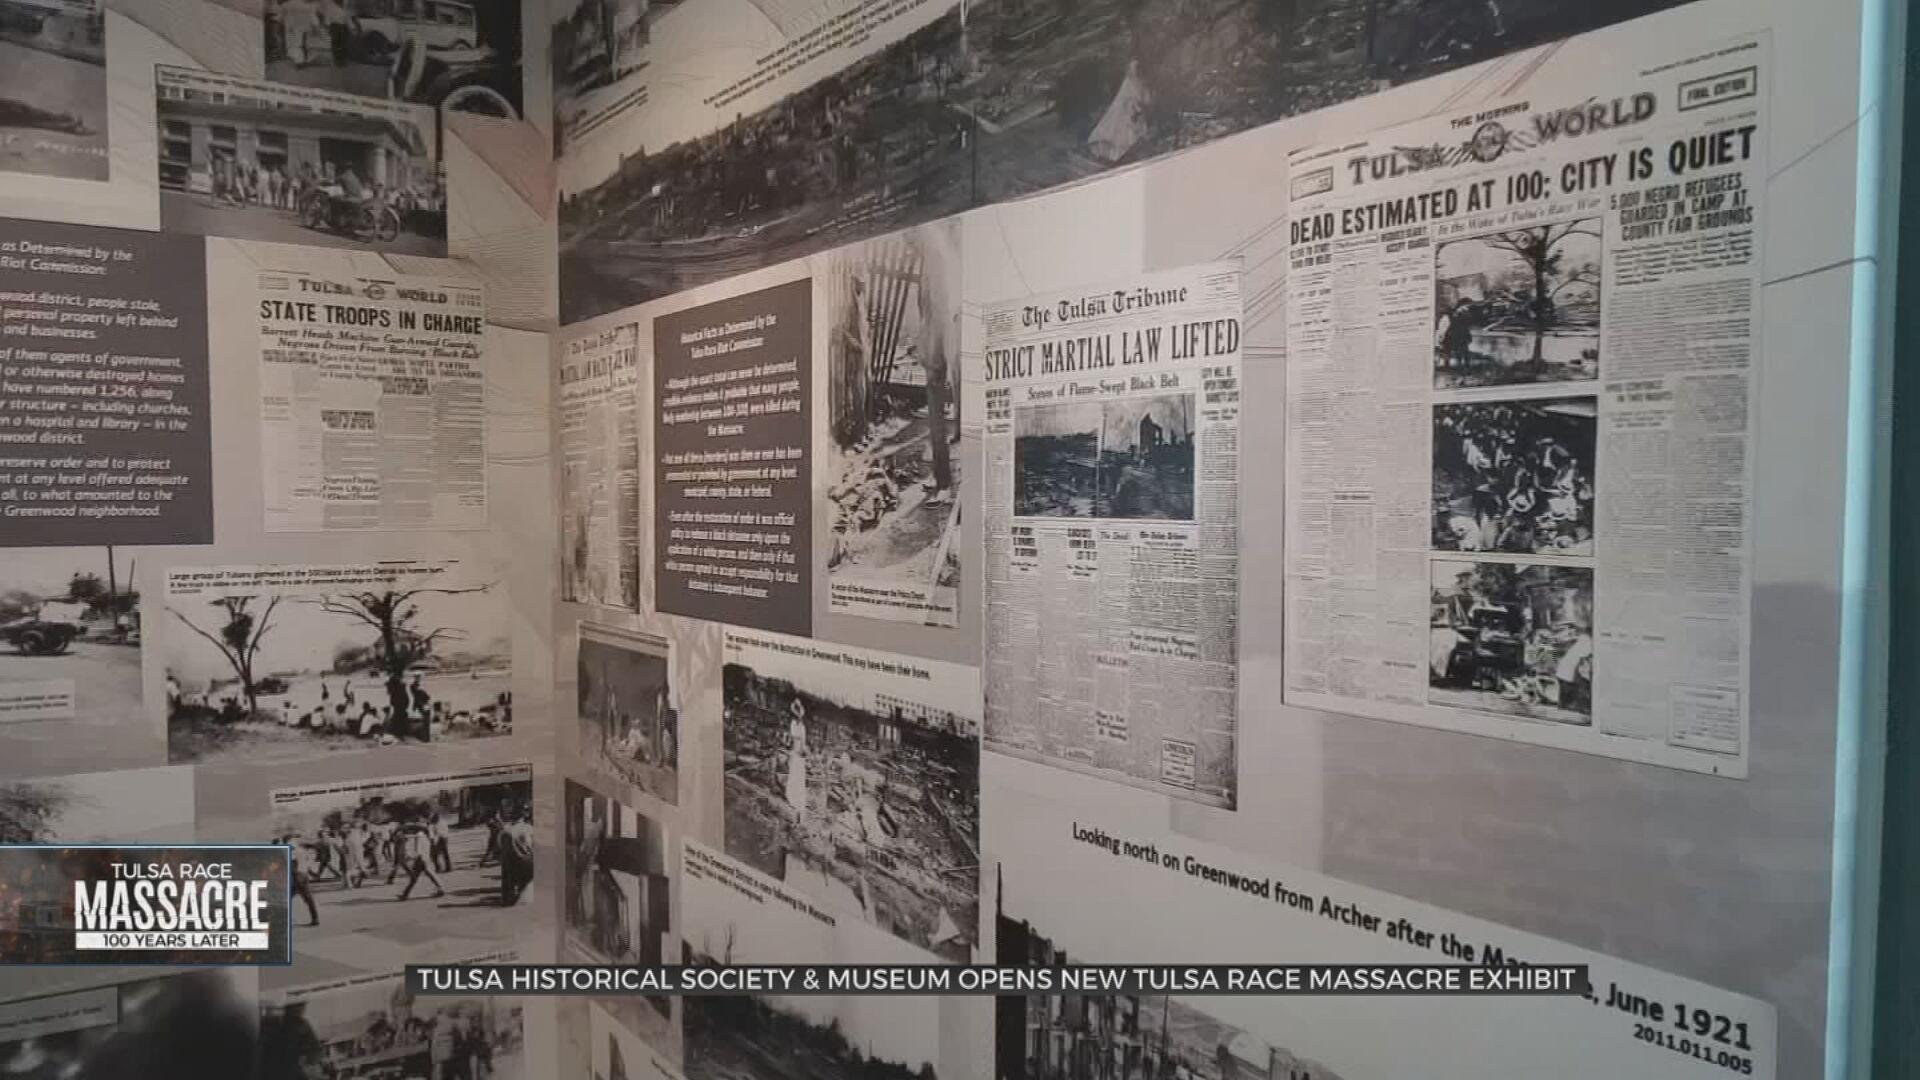 Tulsa Historical Society's New Exhibit Documents Destruction, Recovery After Race Massacre